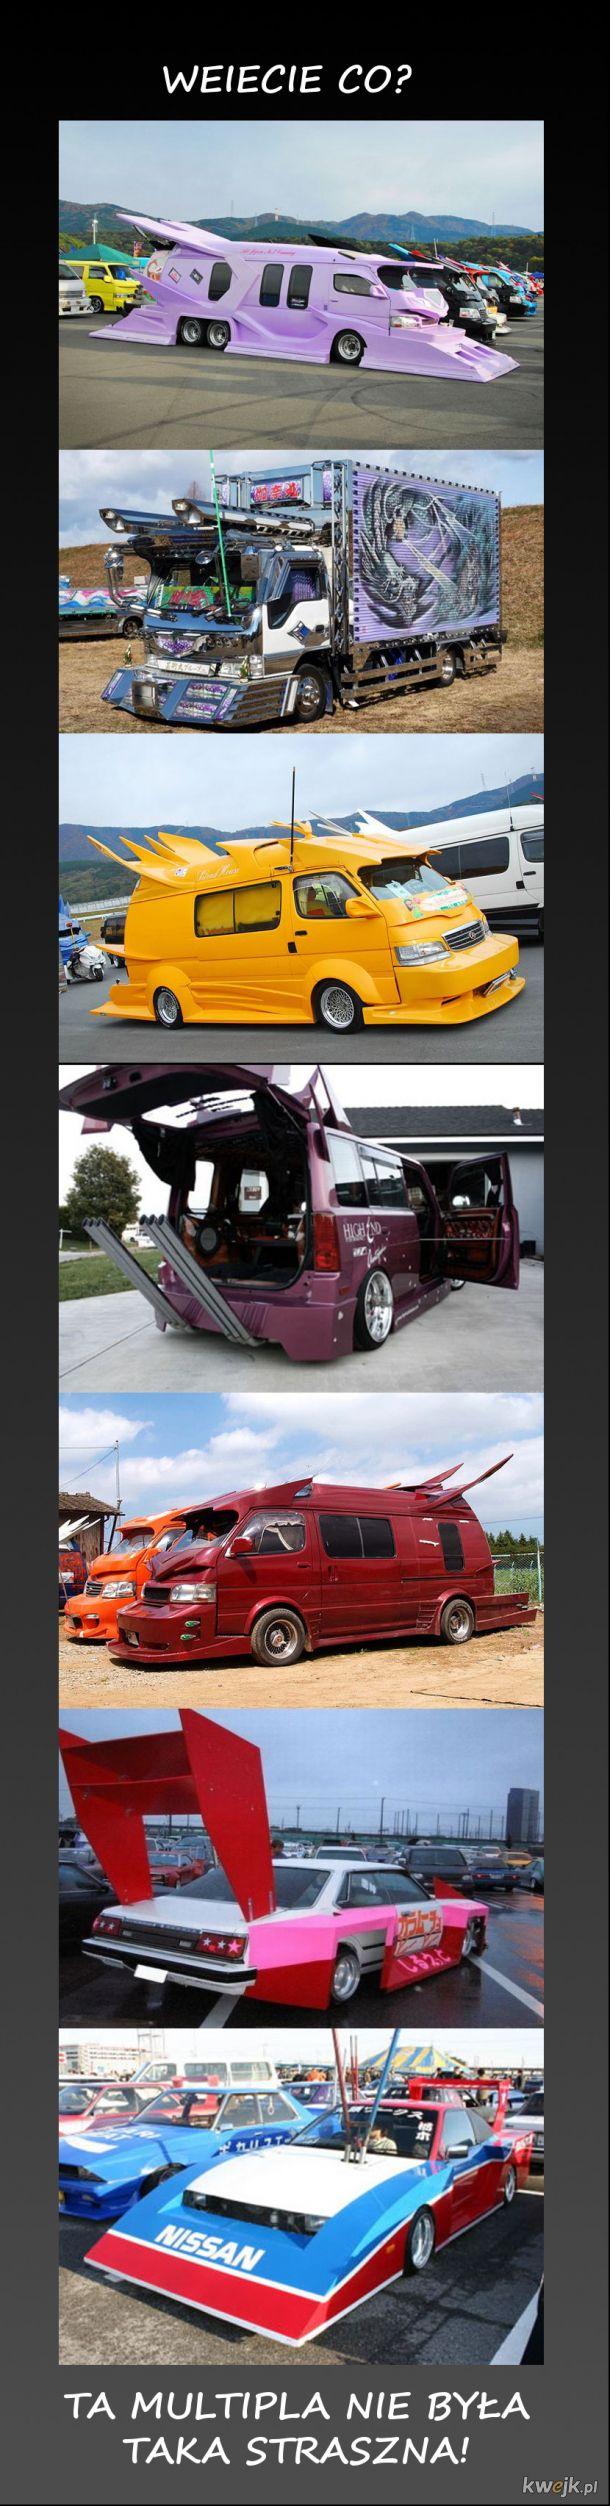 SUPER CAR DIZAJN EWRYBODY POMARAŃCZE